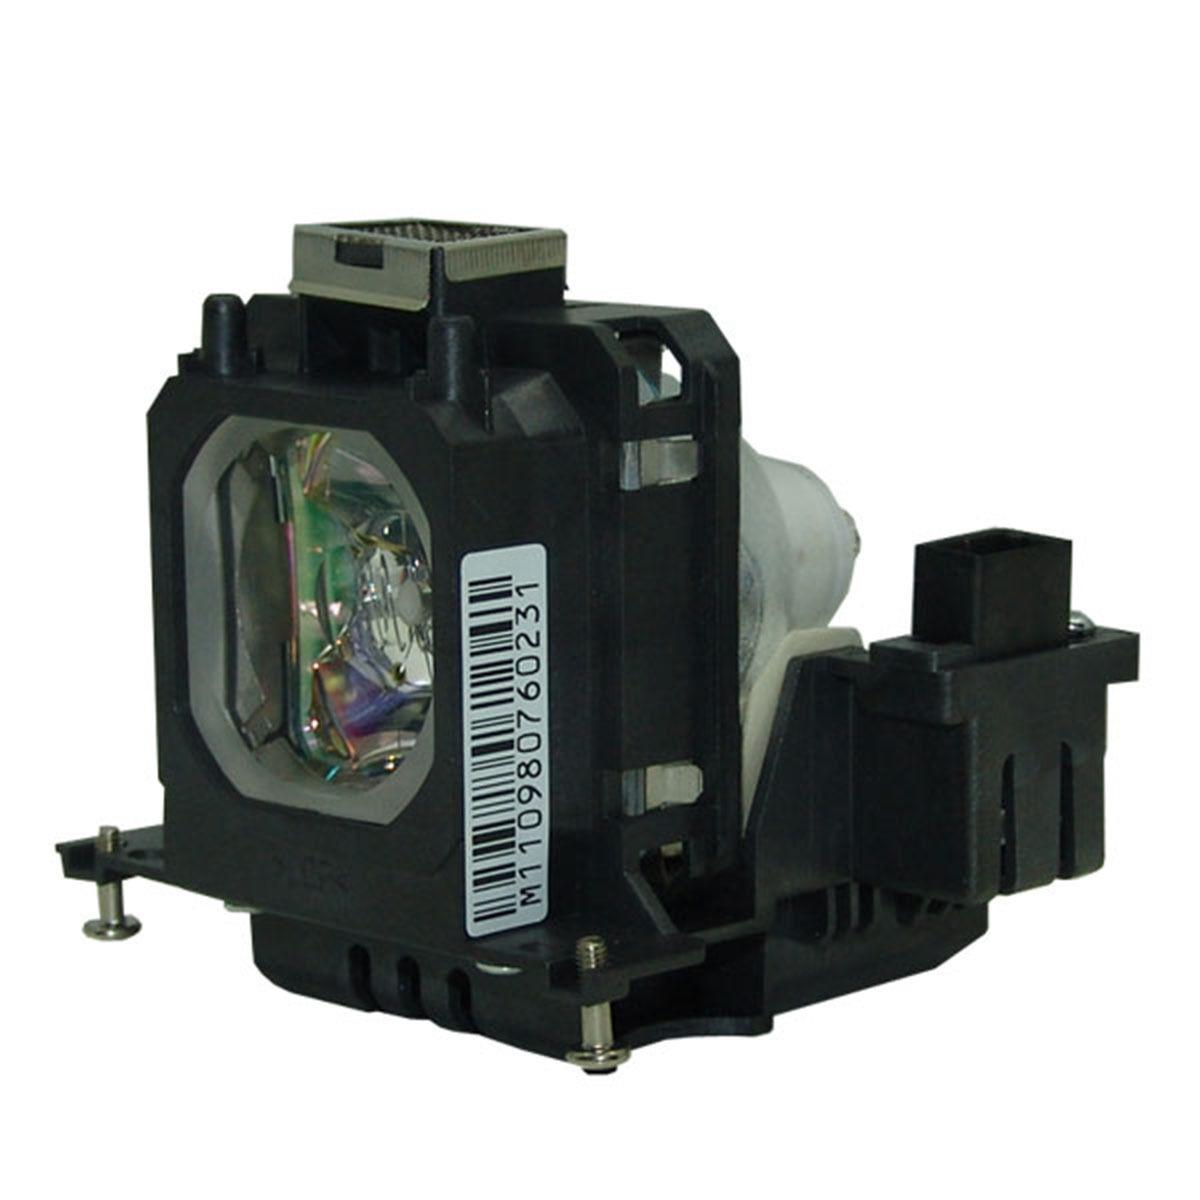 POA-LMP114 LMP114 610-3365404 for SANYO PLV-Z800 PLV-Z2000 PLV-Z700 PLV-Z3000 PLV-Z4000 PLV-1080HD Projector Bulb Lamp With Case 114 0175 358 мойка кухонная rog 610 41 сахара ronda franke